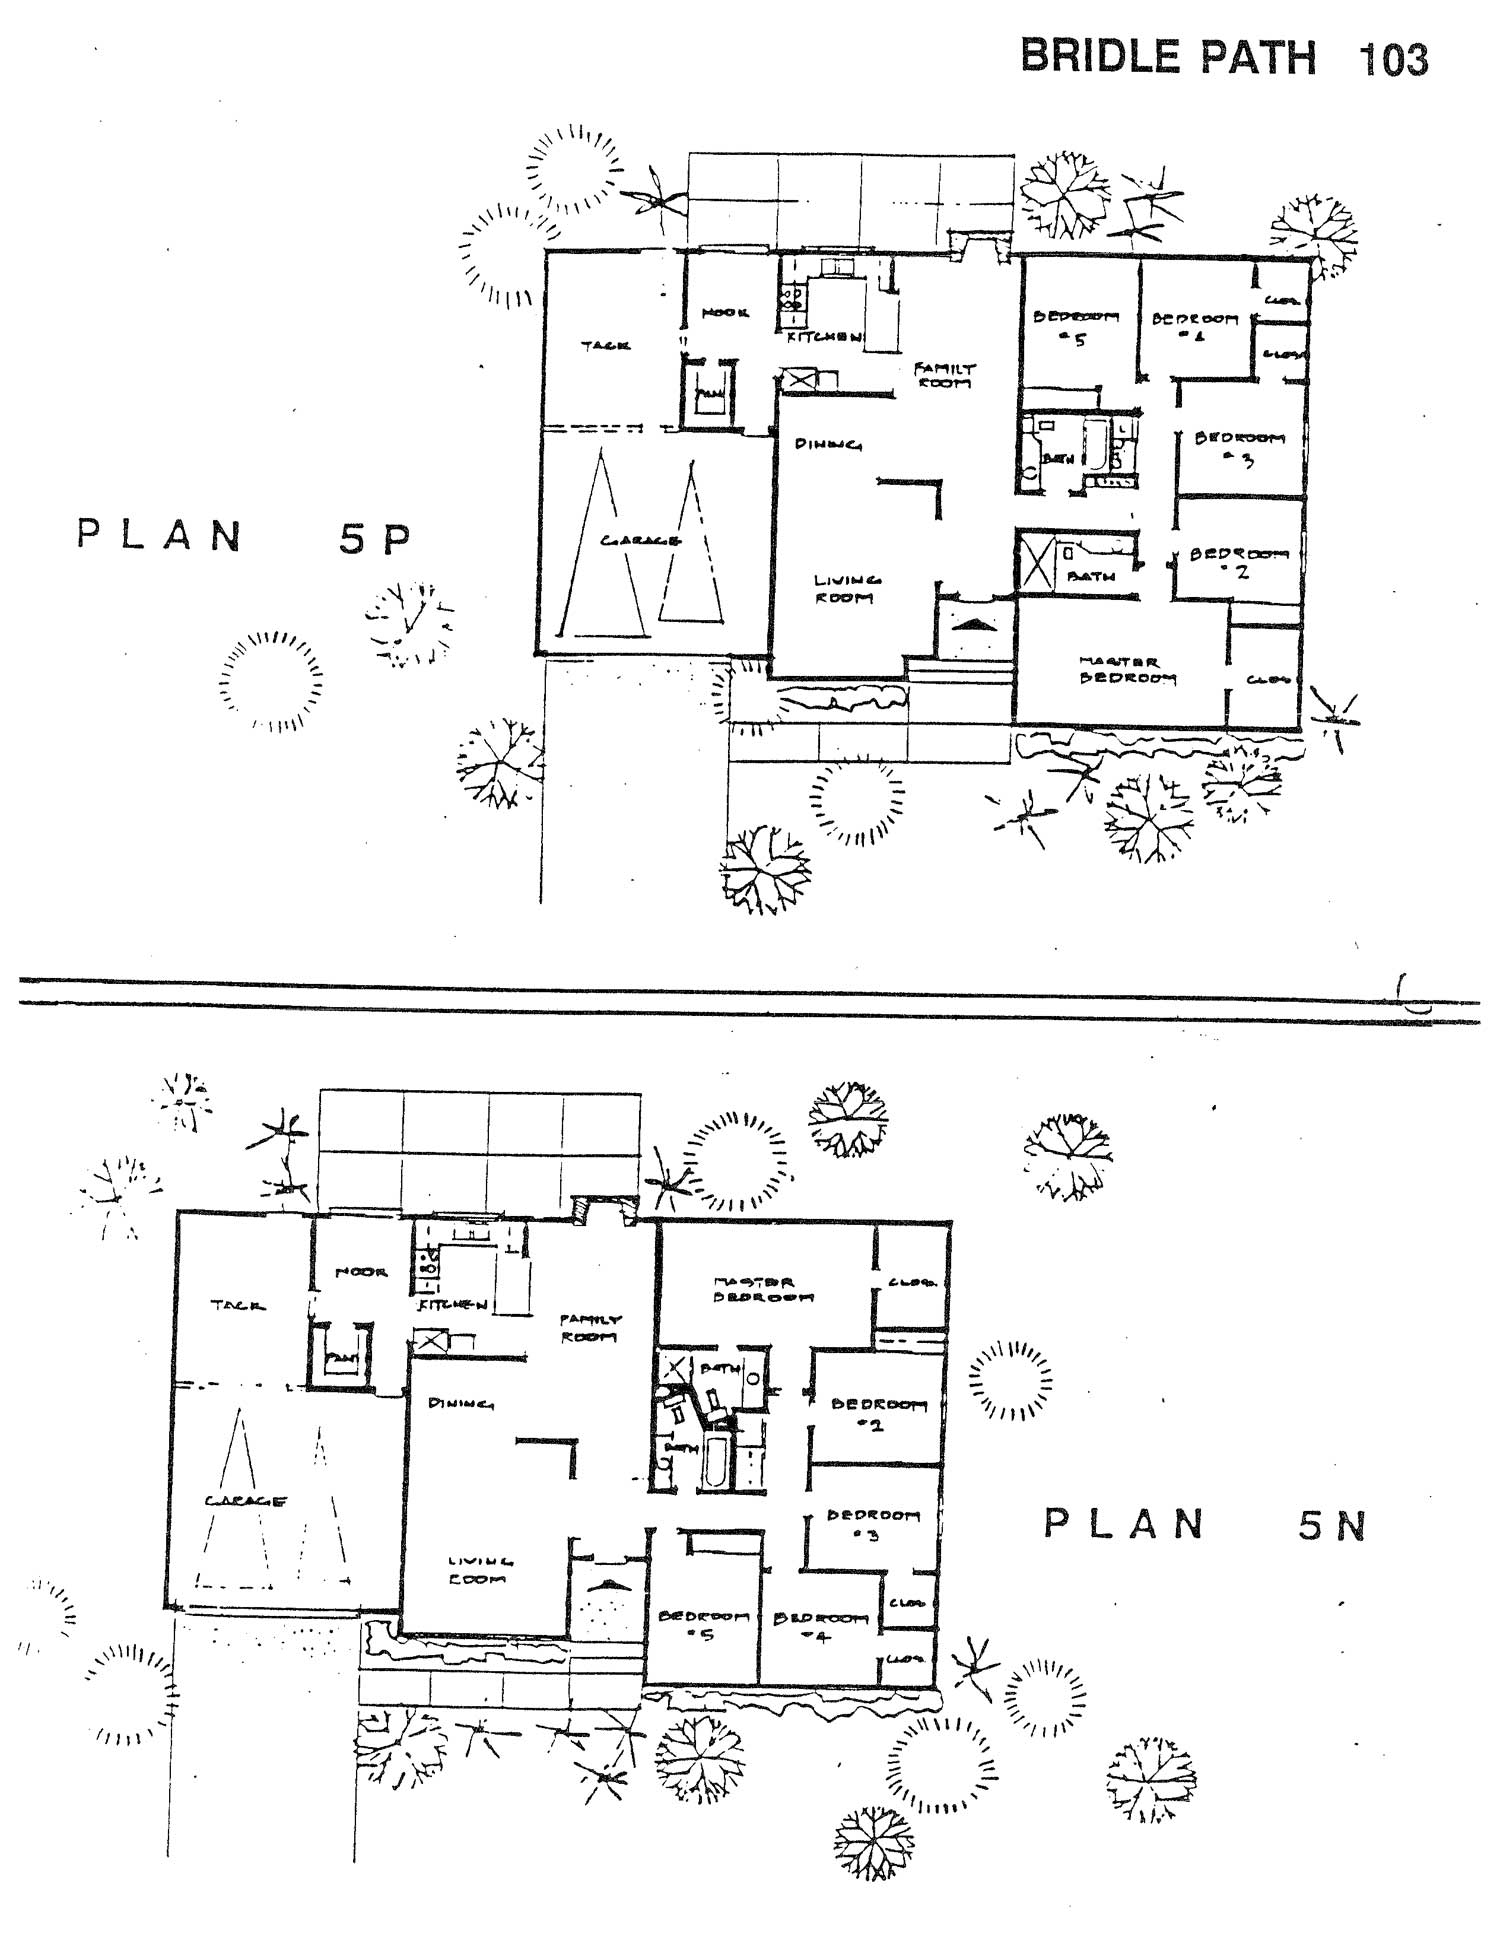 Bridle Path - Plan 5P & 5N